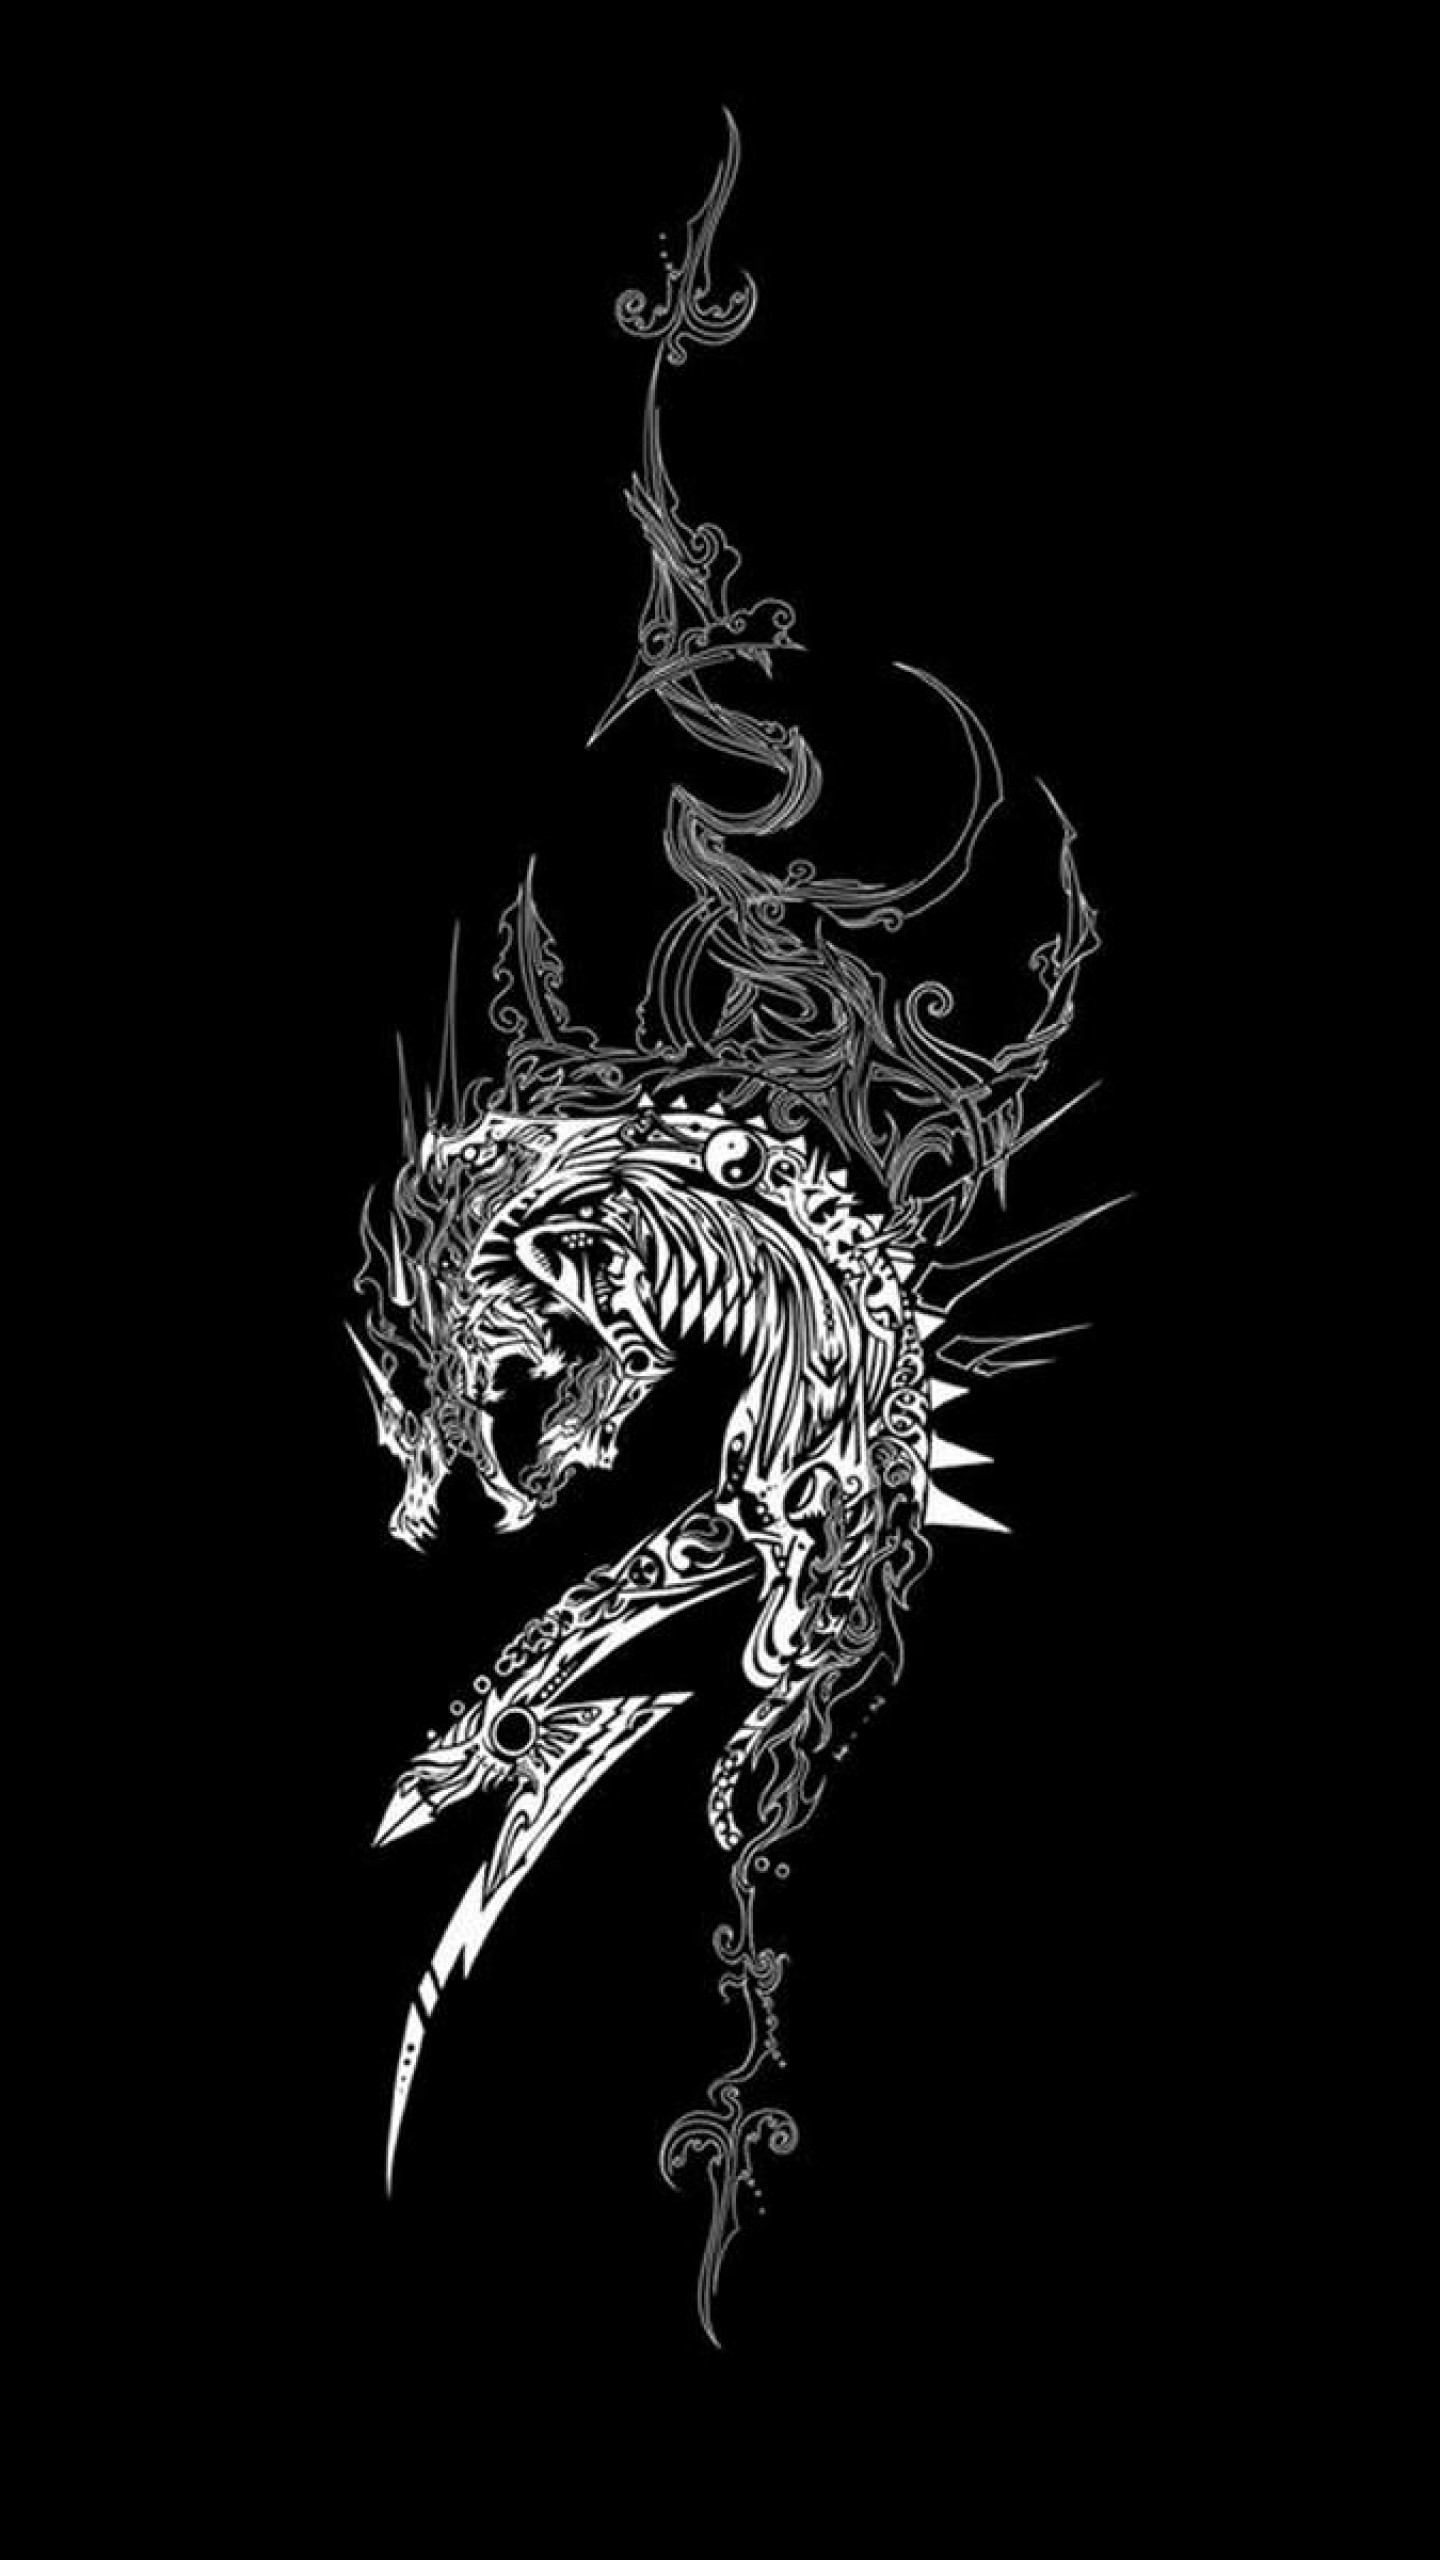 Kali Linux Quote Wallpaper White Dragon Wallpaper 76 Images